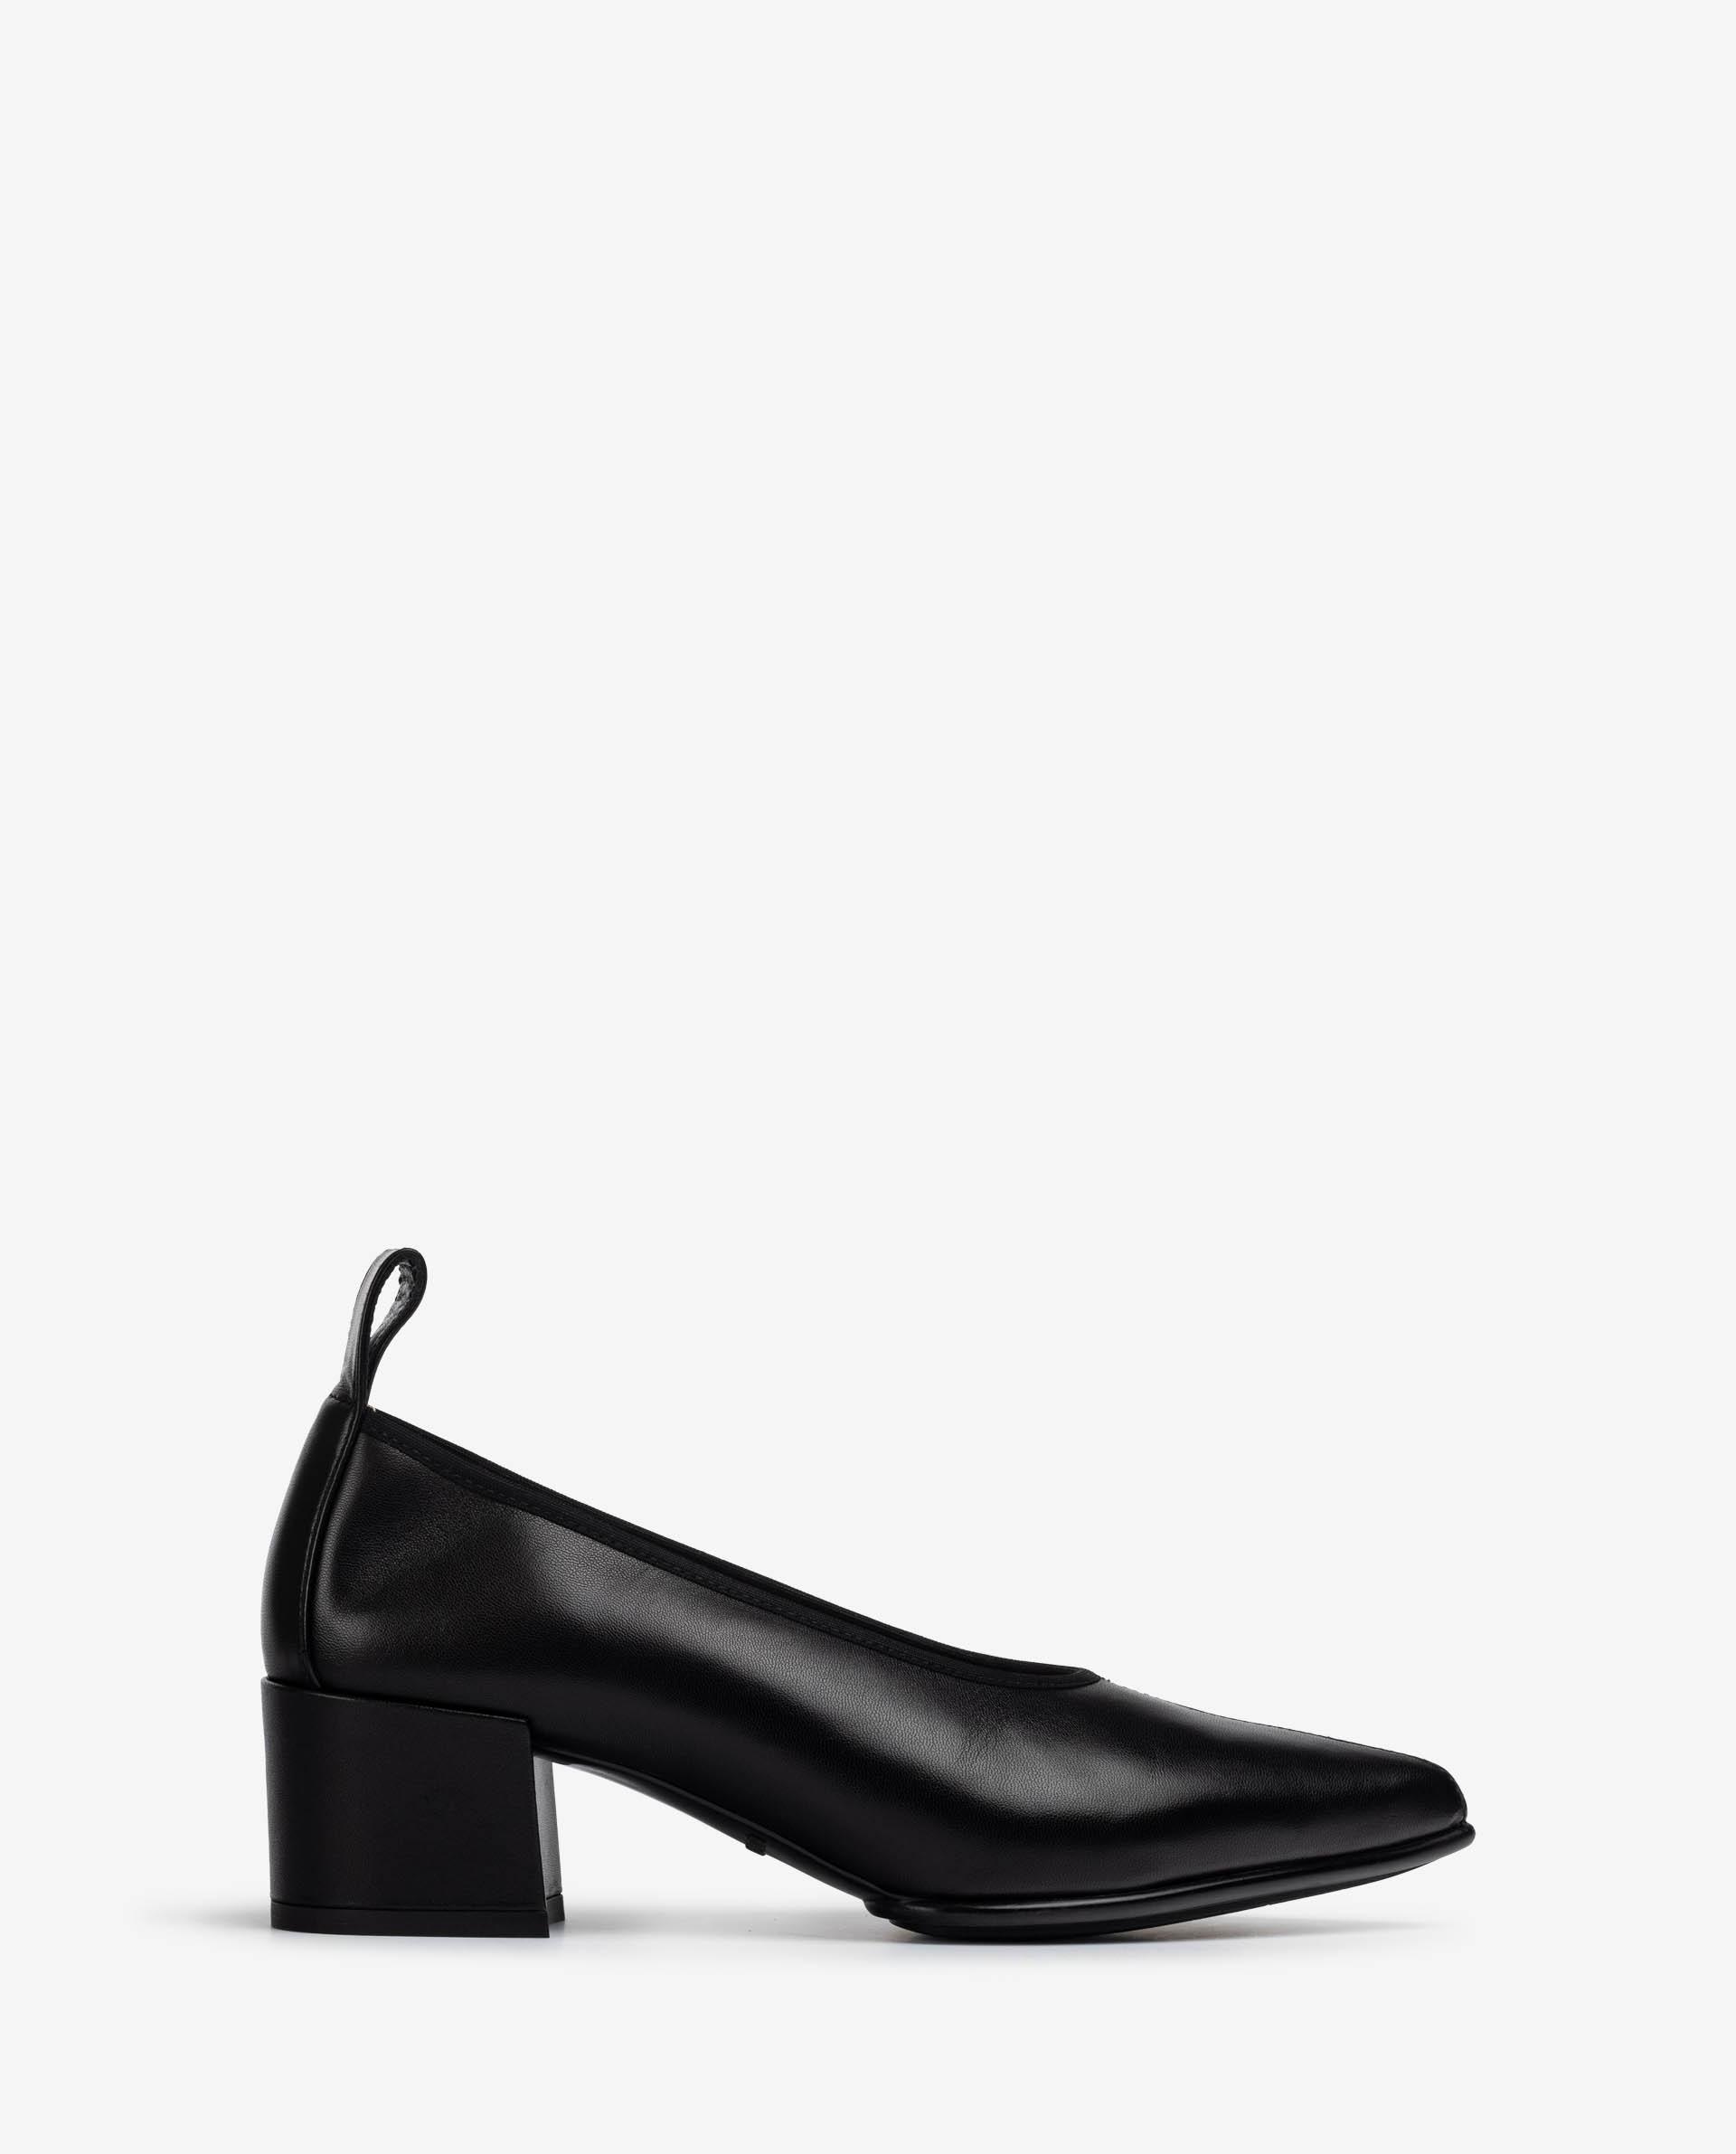 UNISA Medium heel leather pumps with stitching detail JARIFO_VU 2